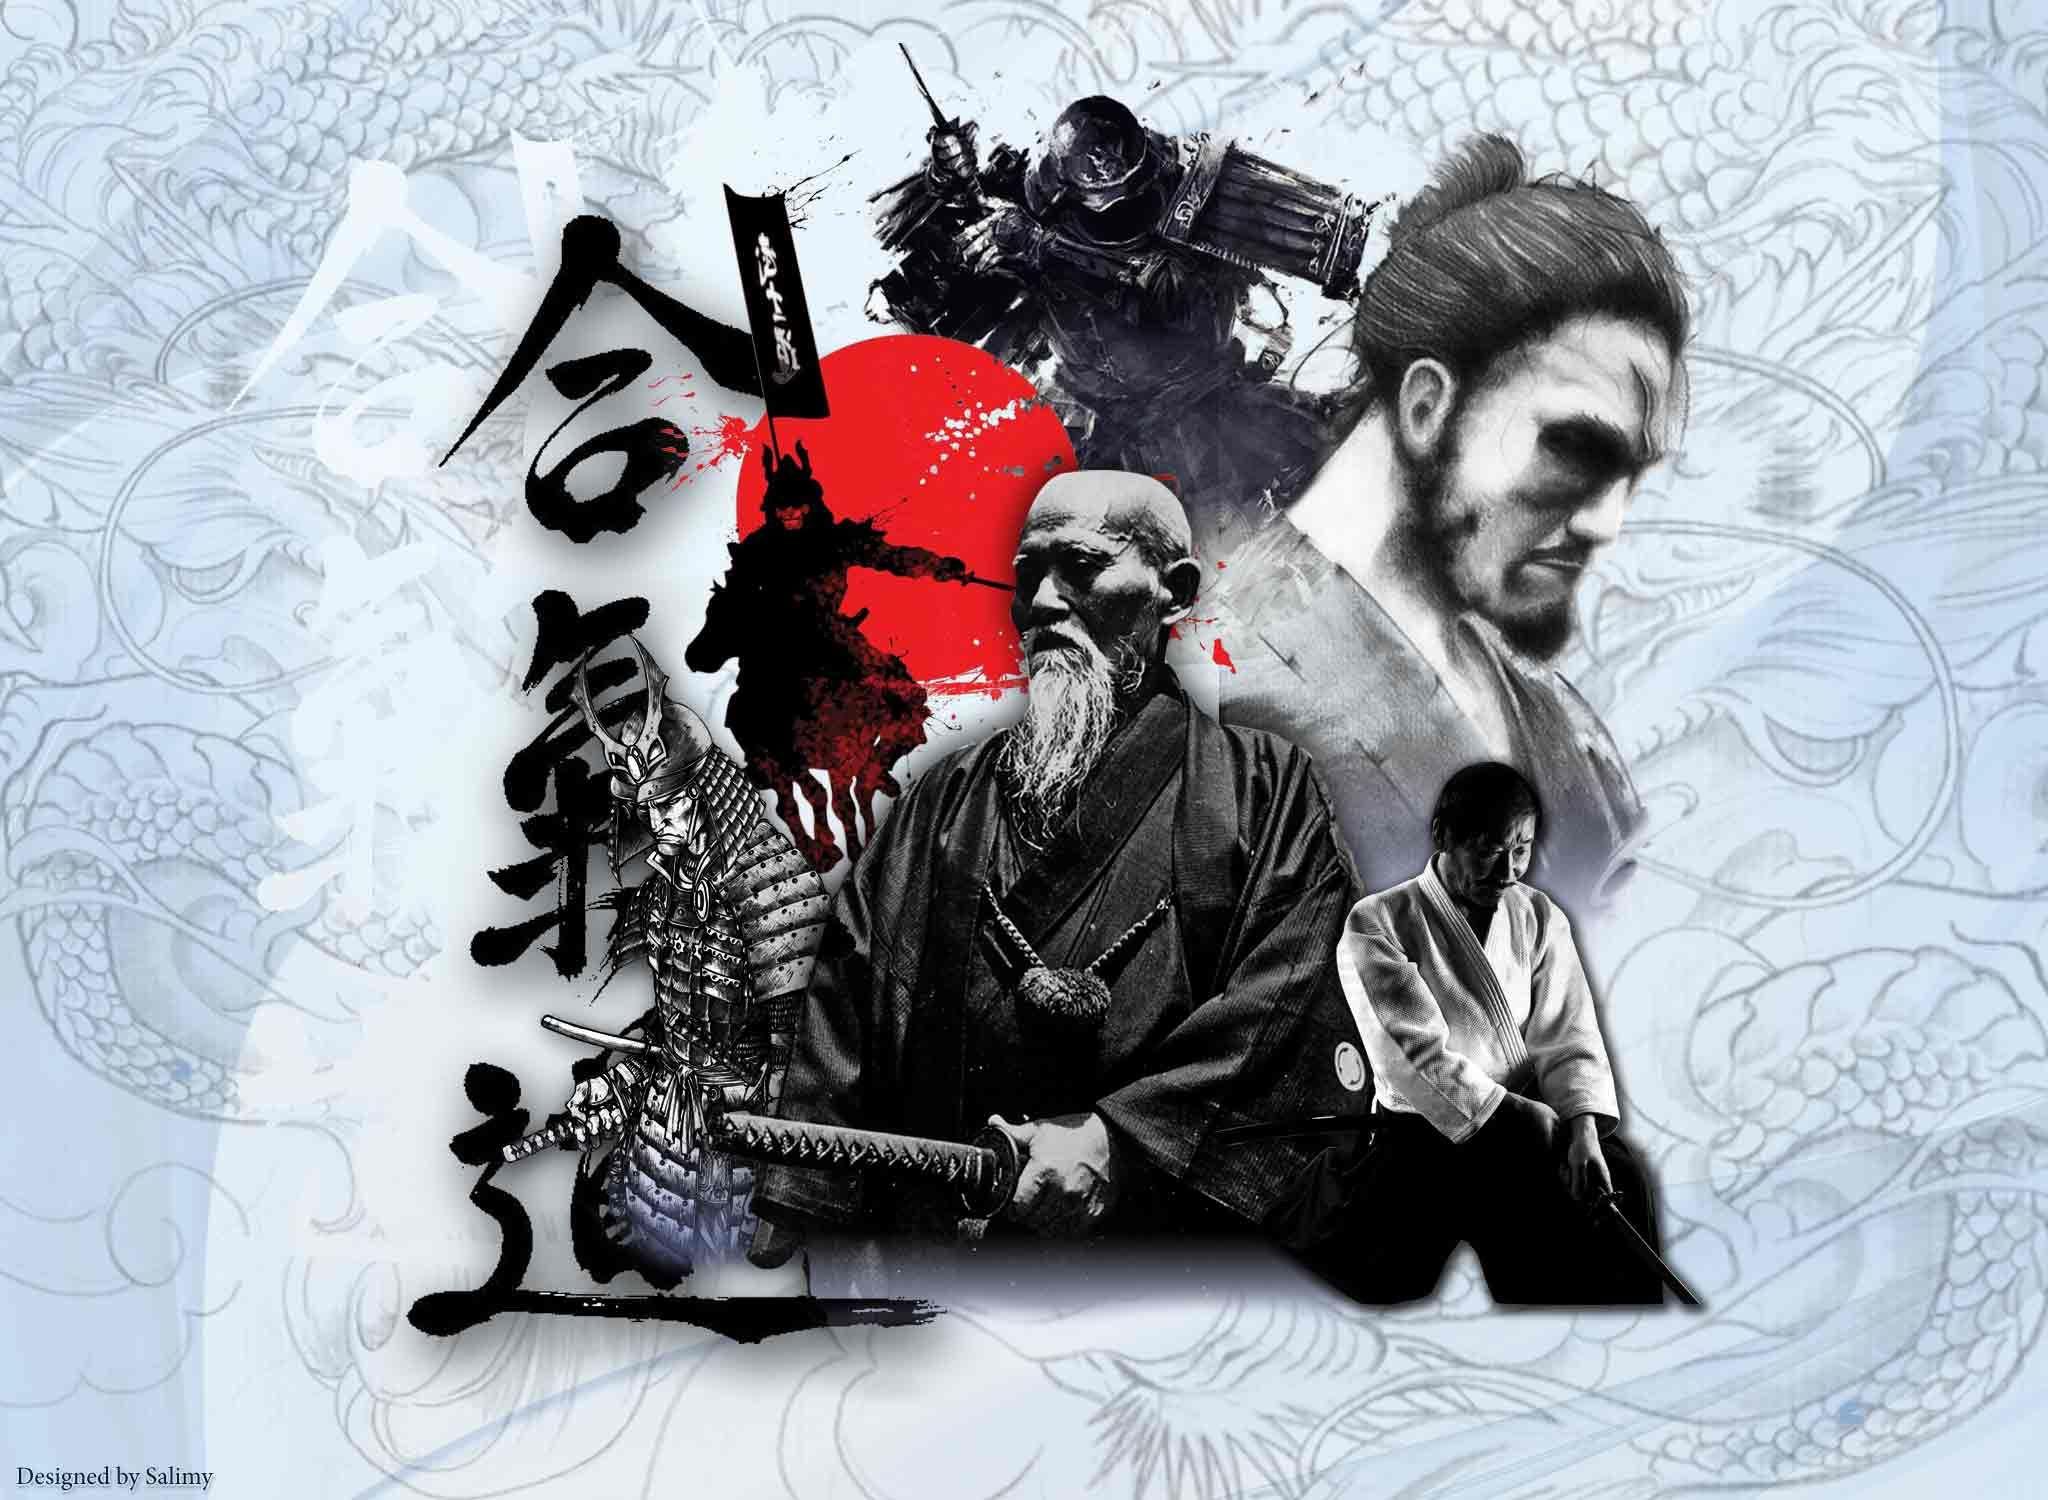 Aikido Wallpaper | Mirath-e-Samurai wallpaper - AikiWeb Aikido Image ...